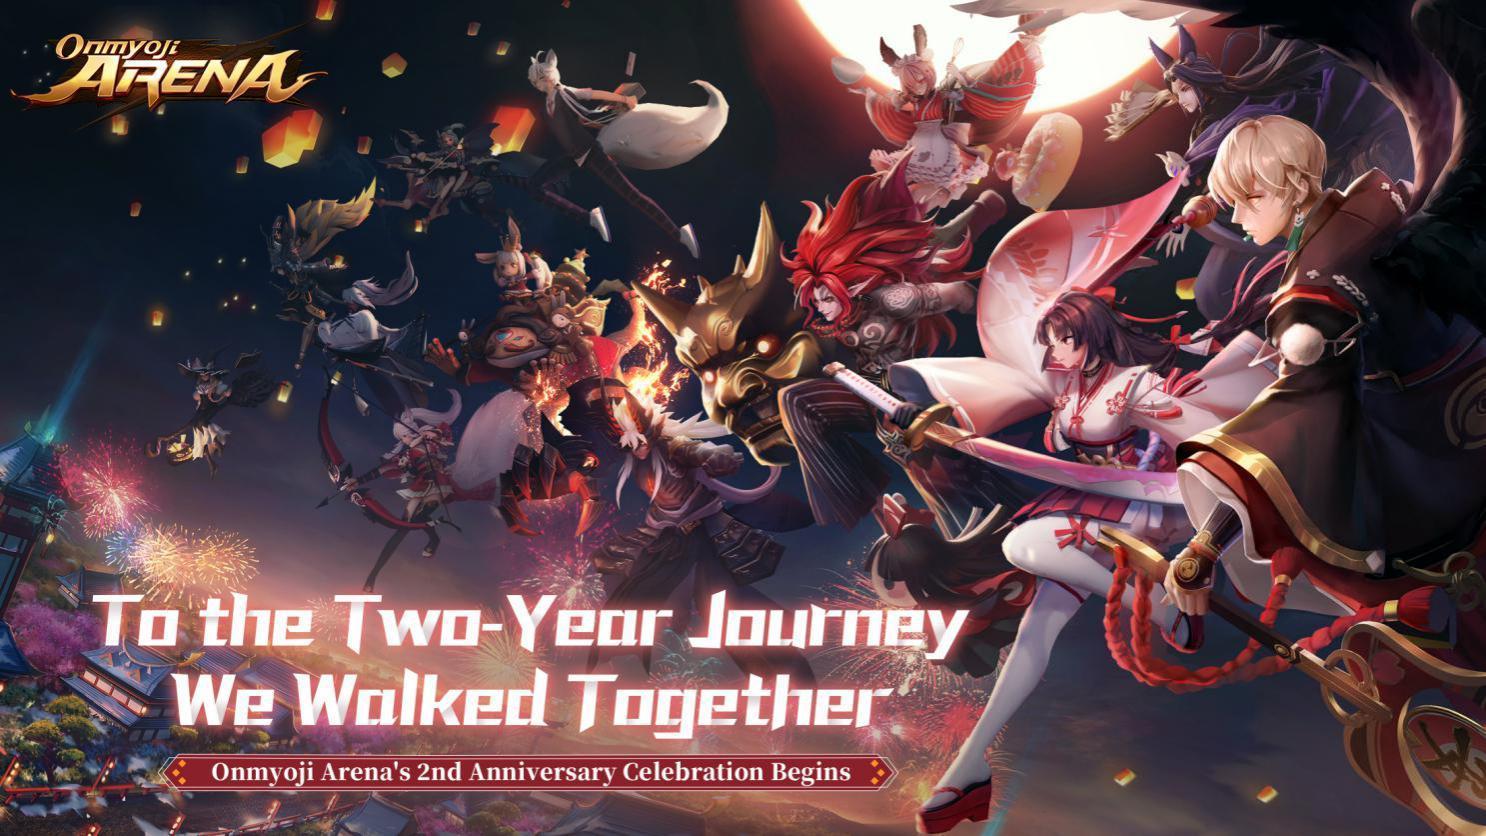 Onmyoji Arena, NetEase Games' Japanese-style MOBA Game Set to Celebrate its 2nd Year Heian Festival